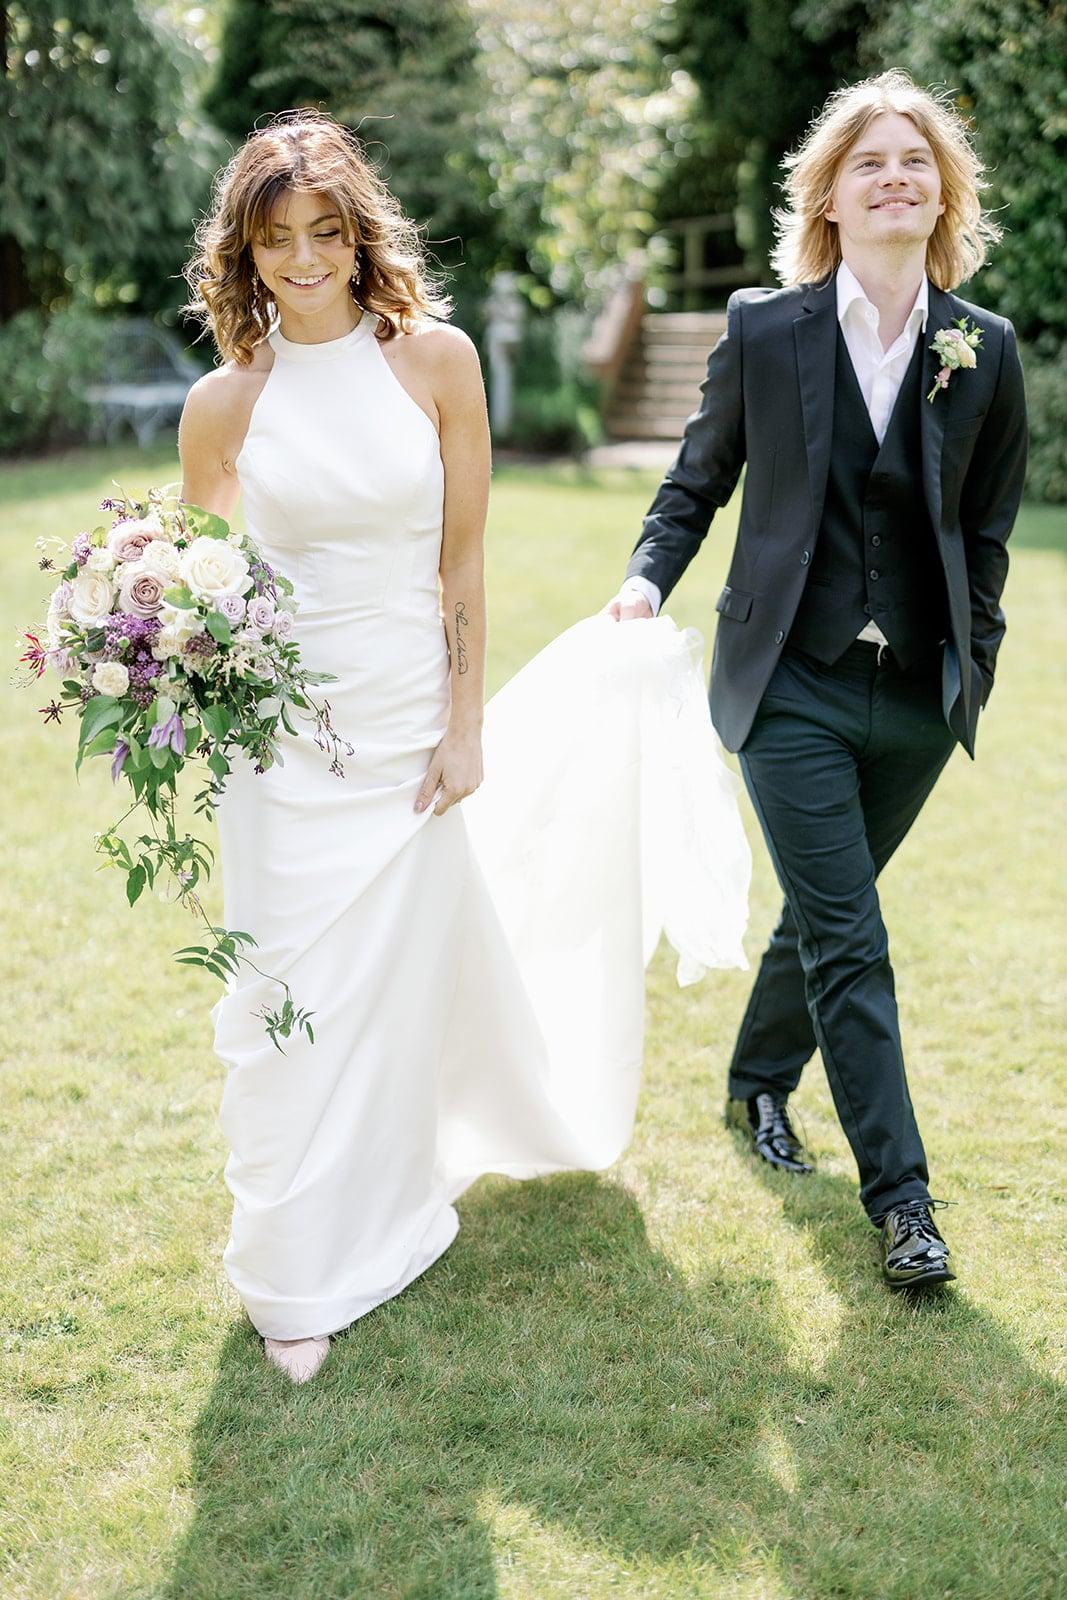 Pelham House wedding photos with wedding photographer Sussex UK